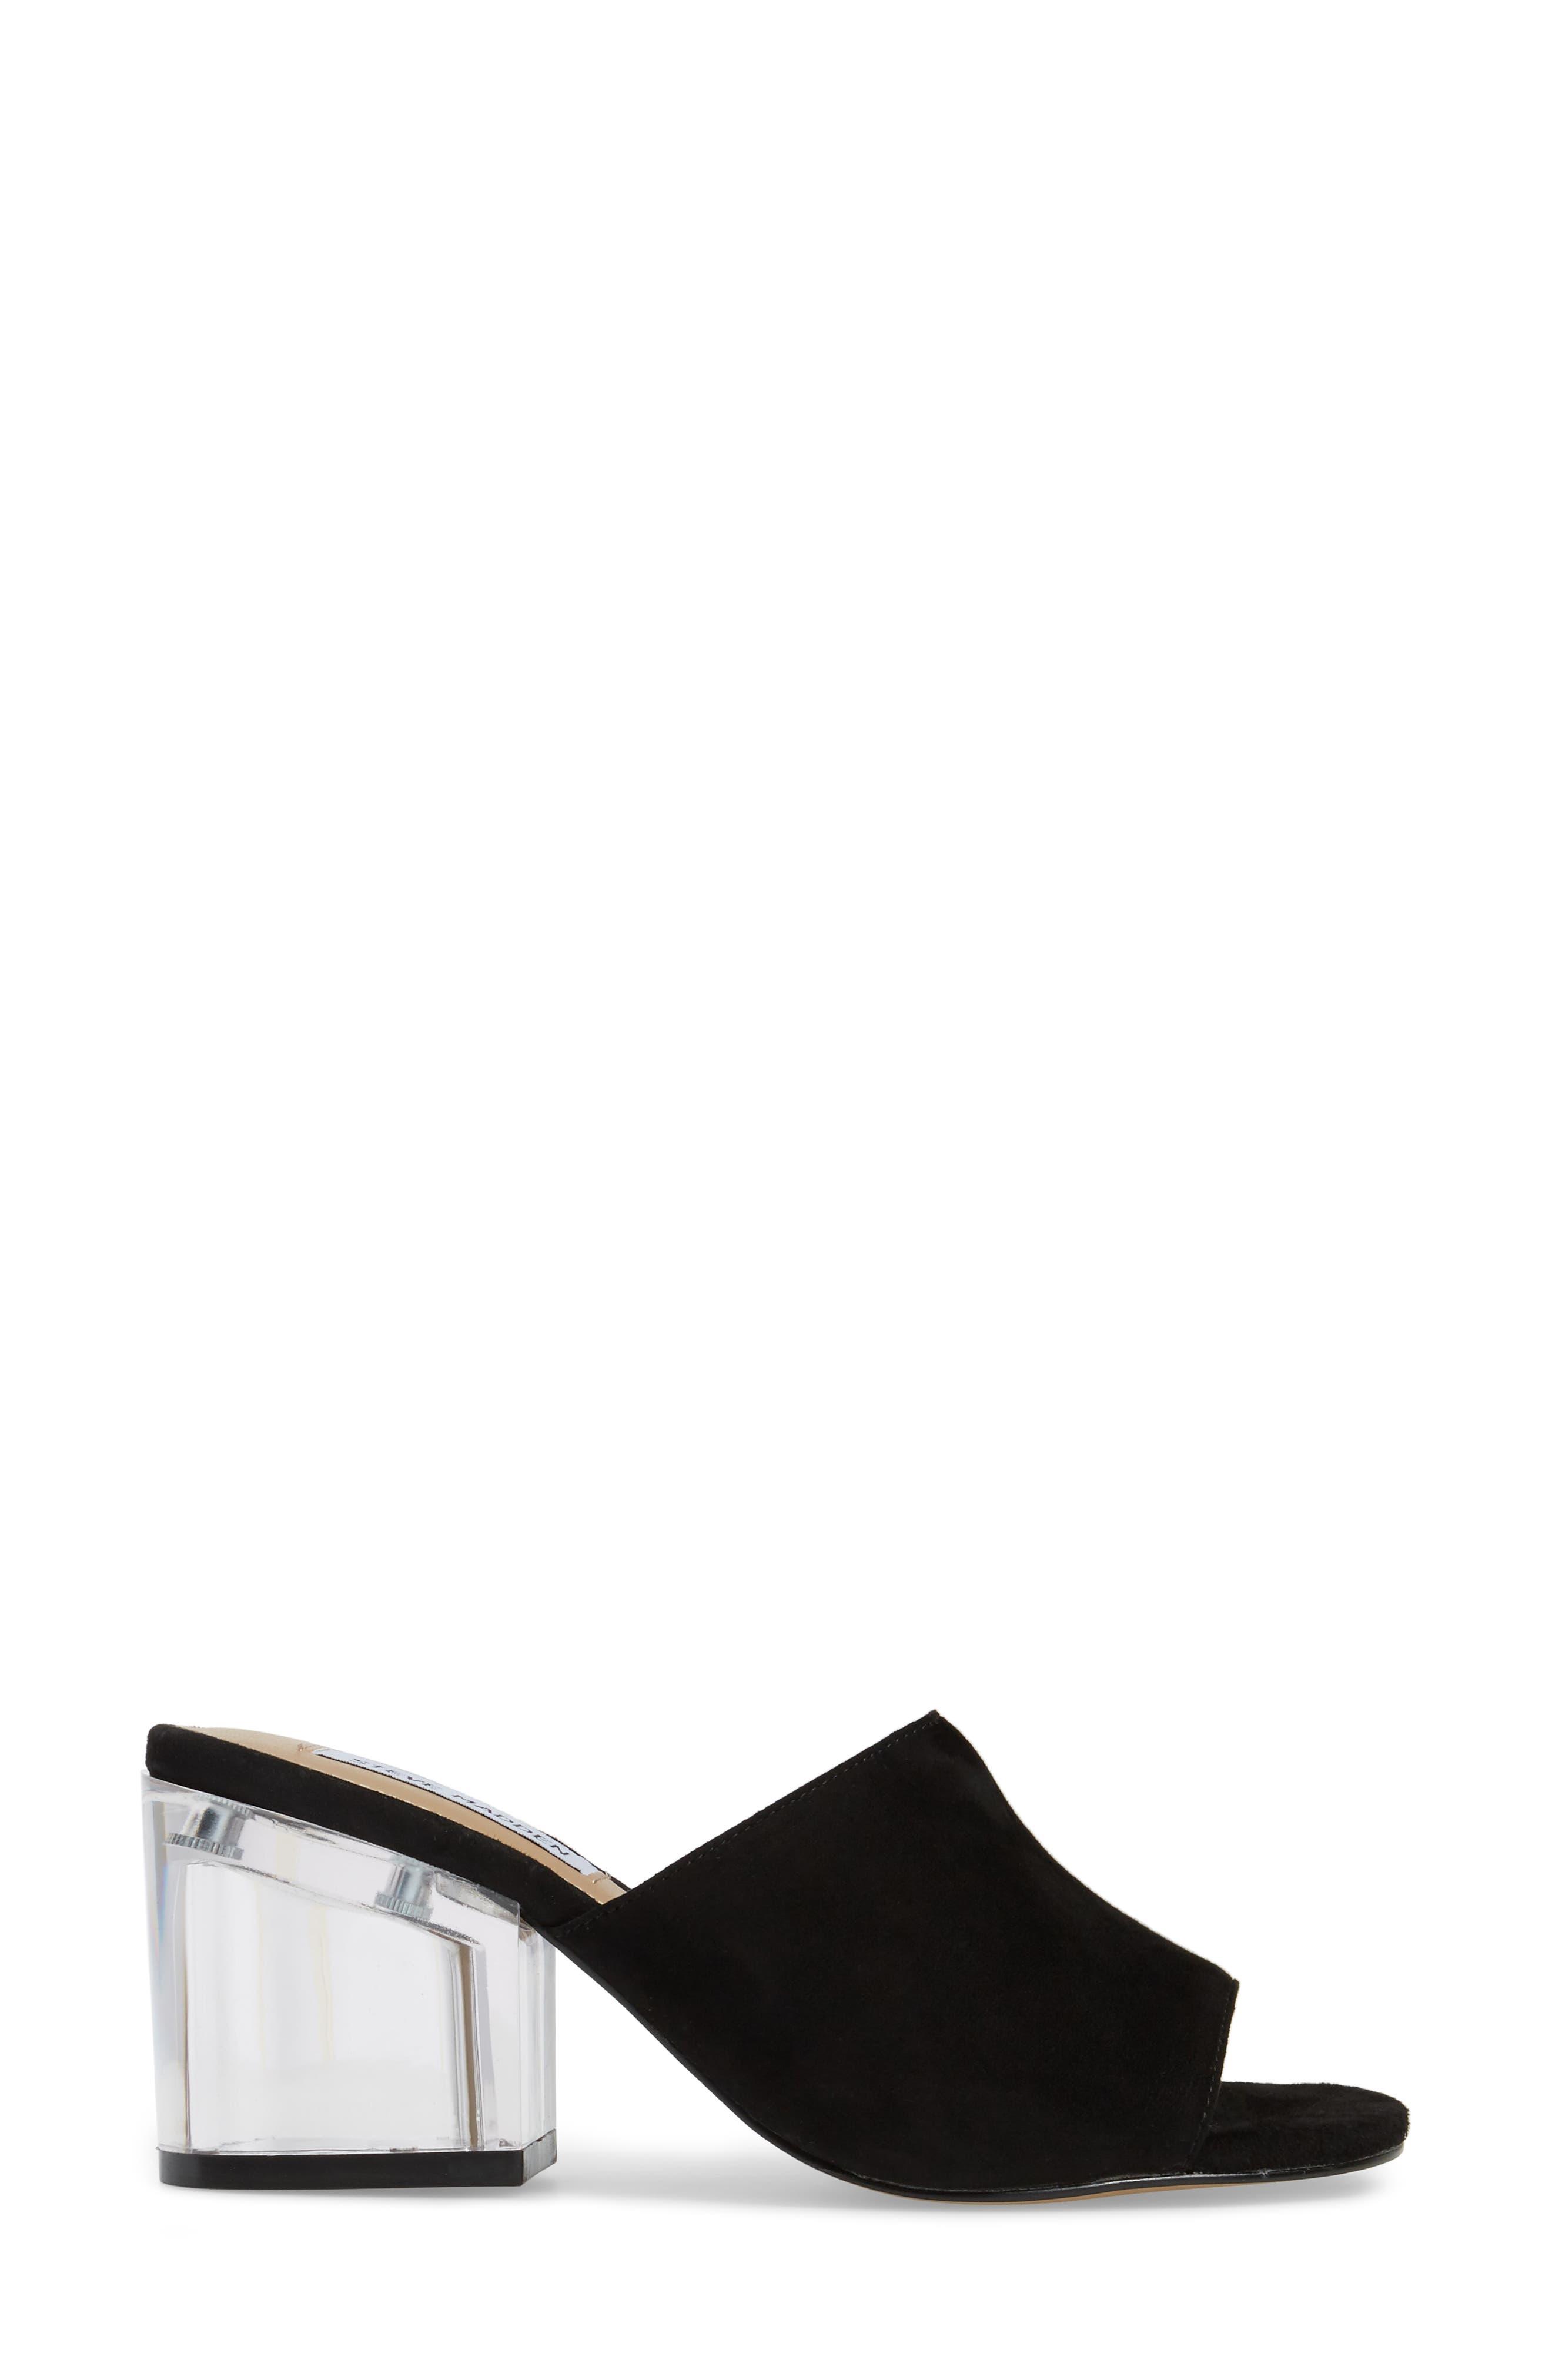 Dalis Clear Heel Slide Sandal,                             Alternate thumbnail 3, color,                             006